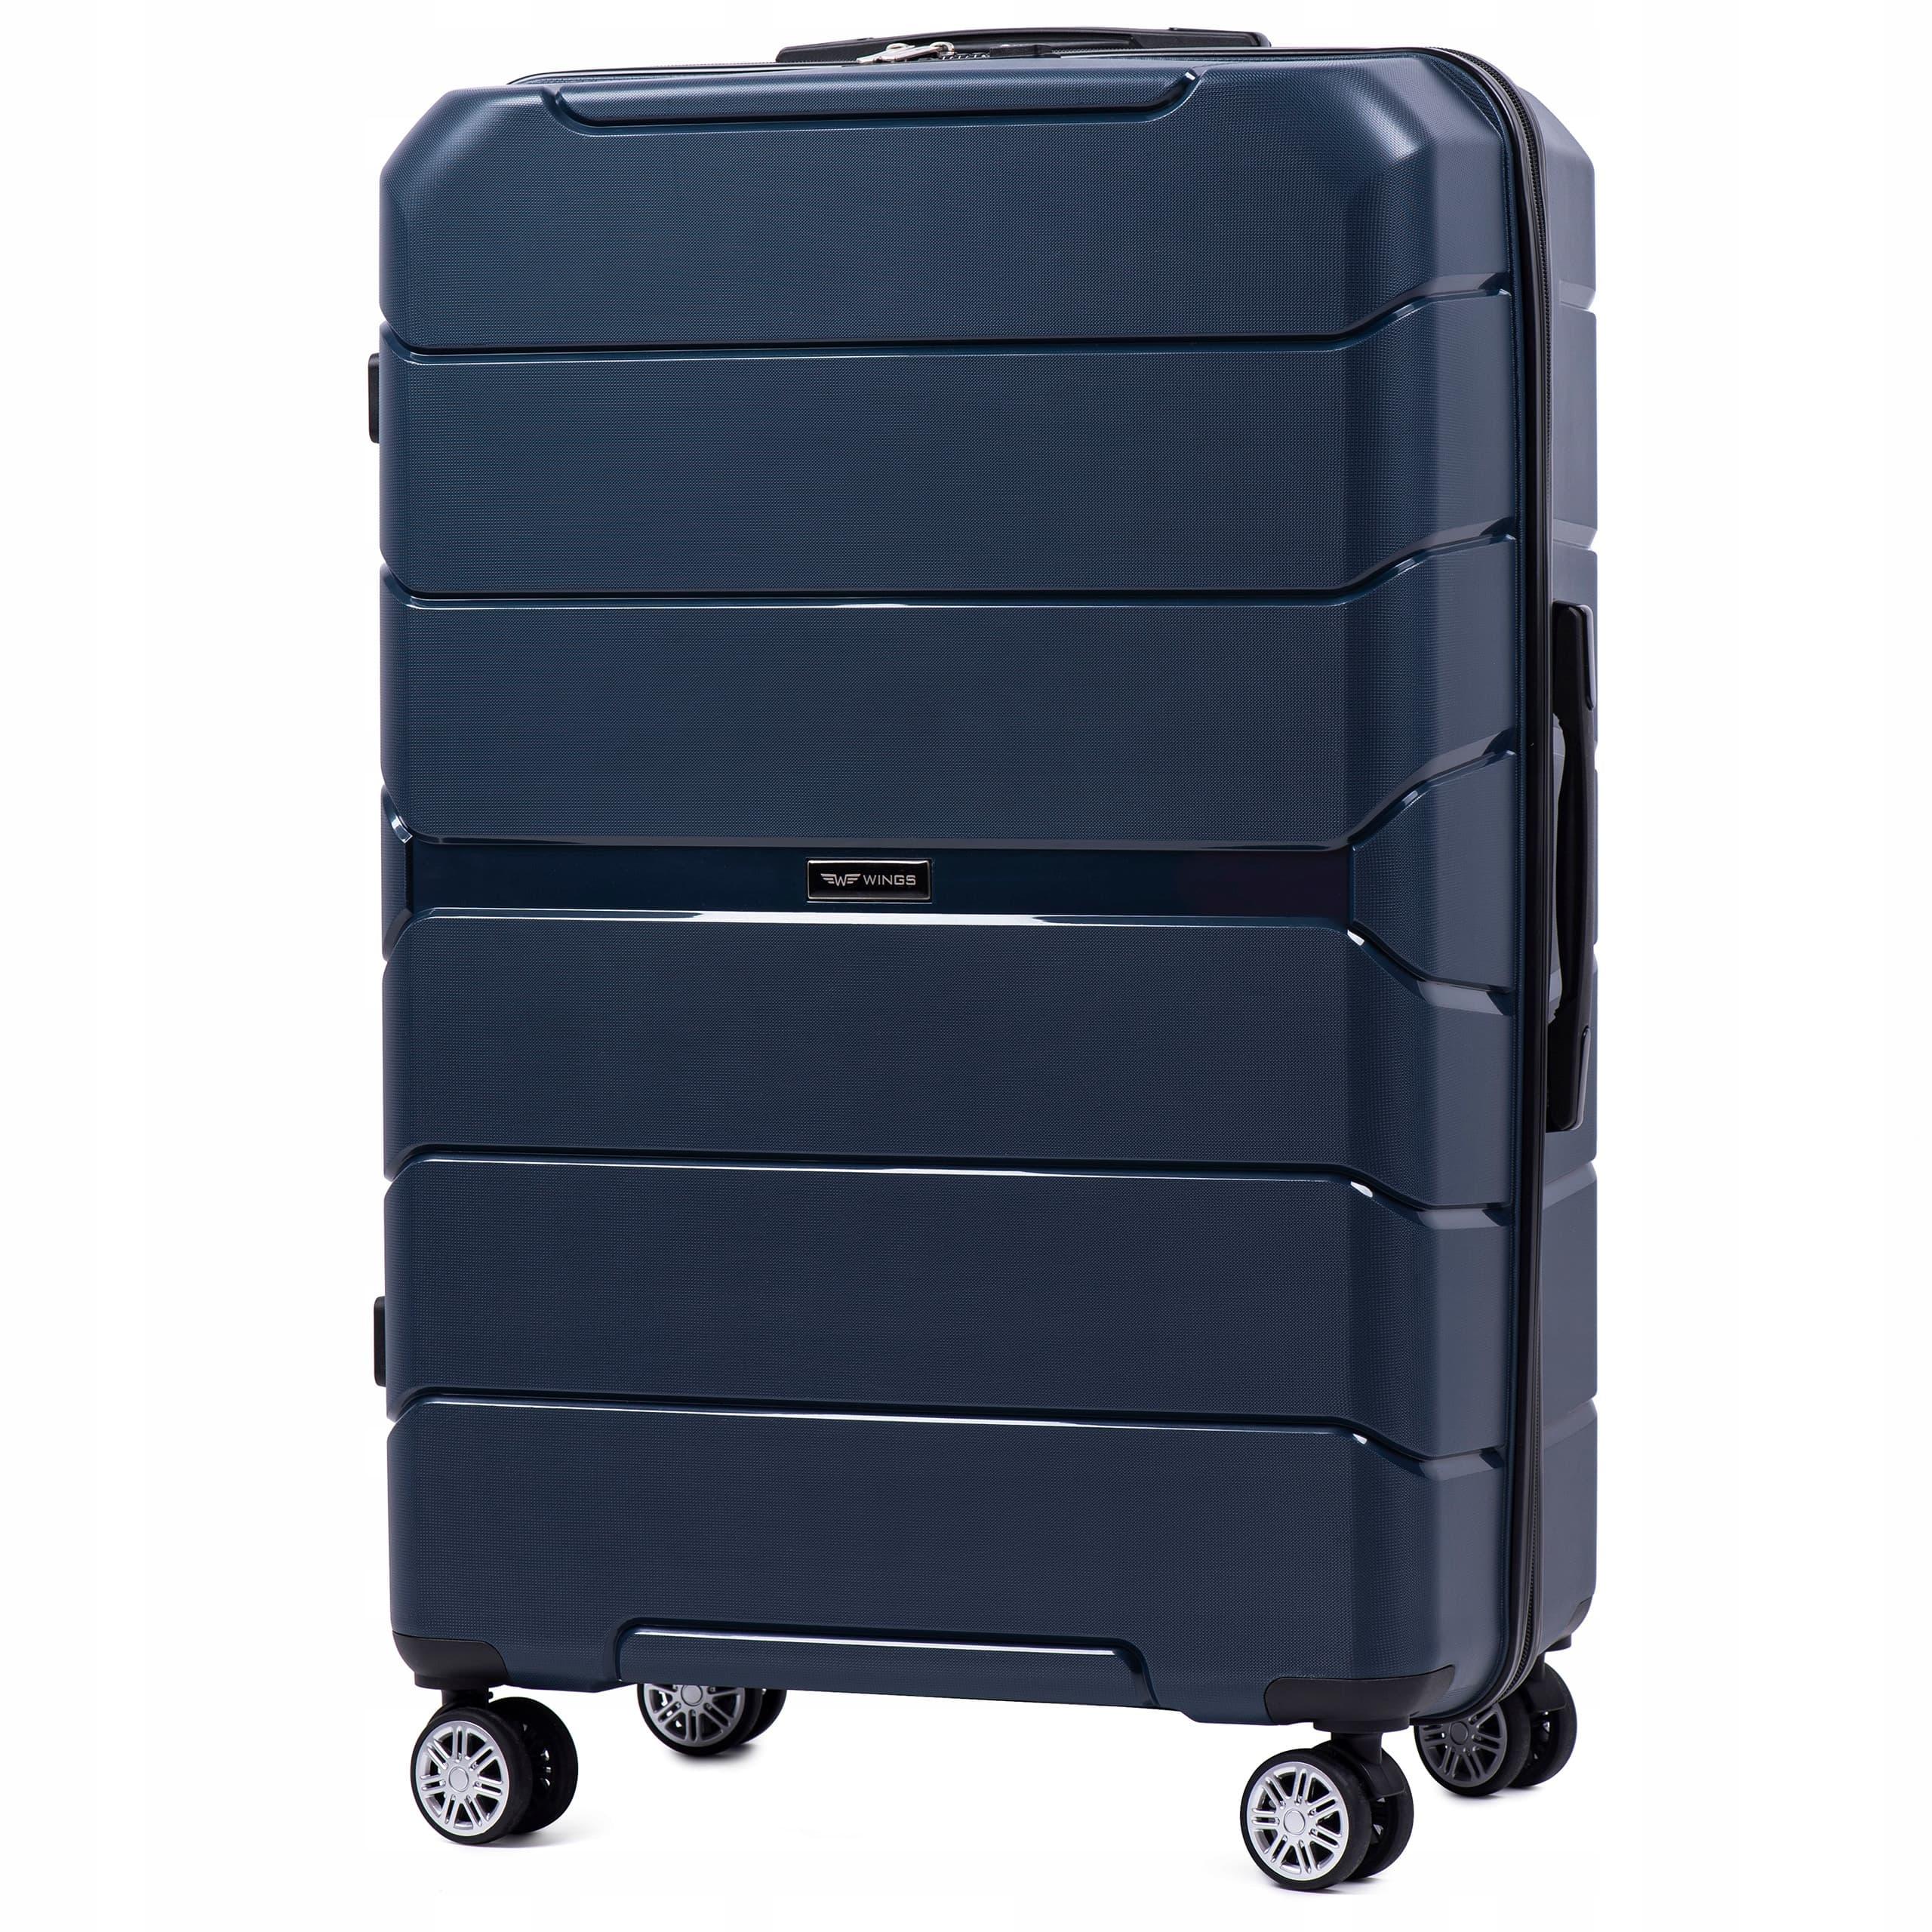 Чемодан БОЛЬШОЙ  из полипропилена на 4-х колесах  WINGS PP-05 L BLUE  Для багажа,до 23 кг